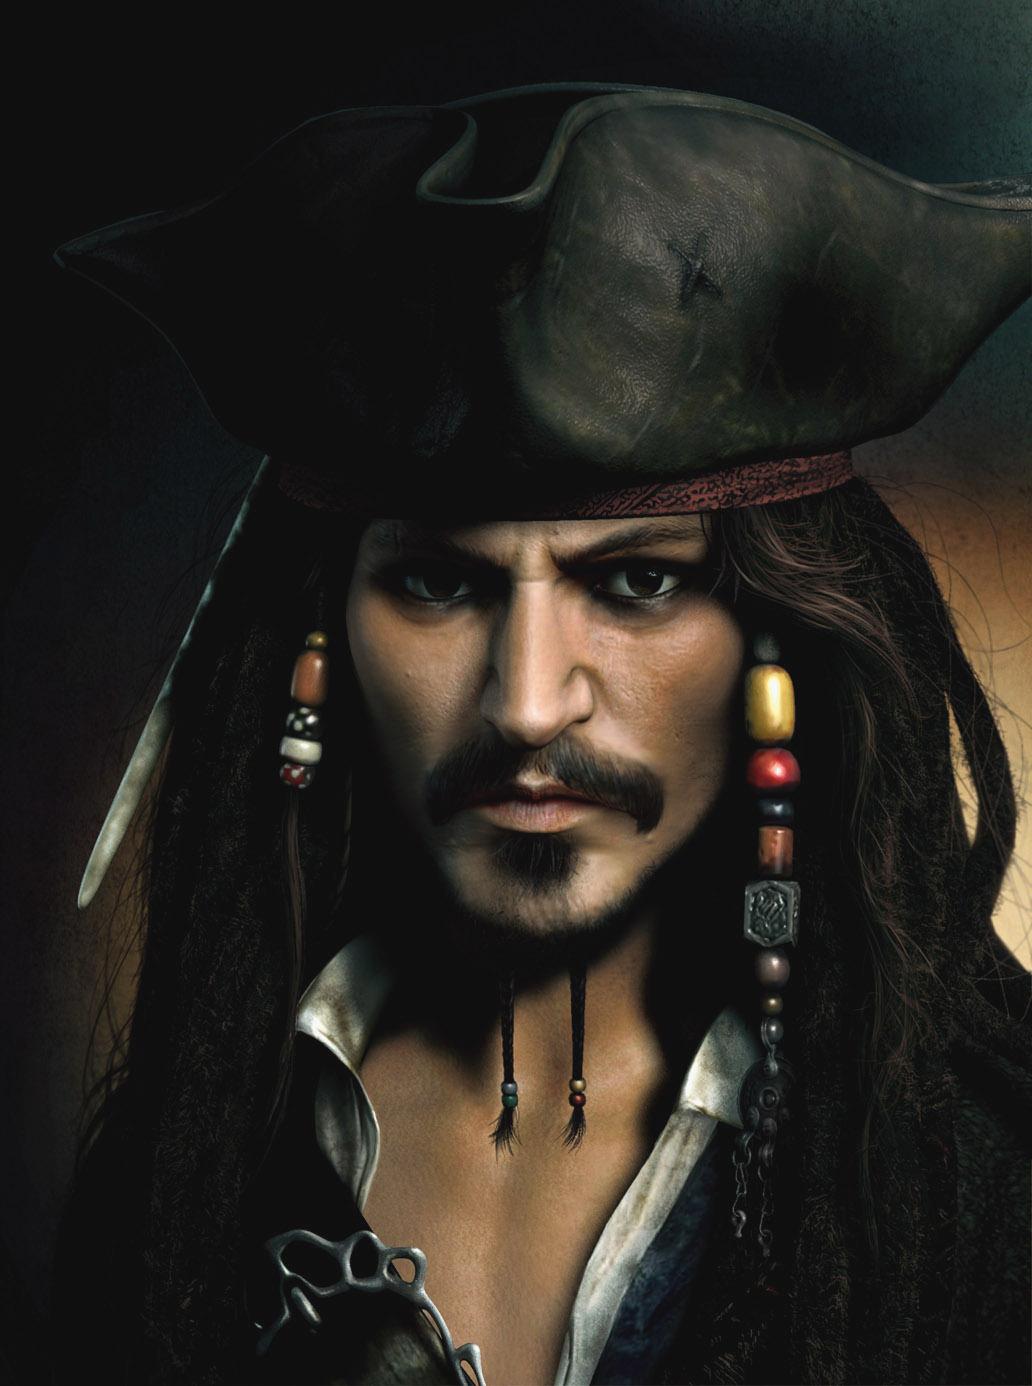 Captain Jack Sparrow by JPRart